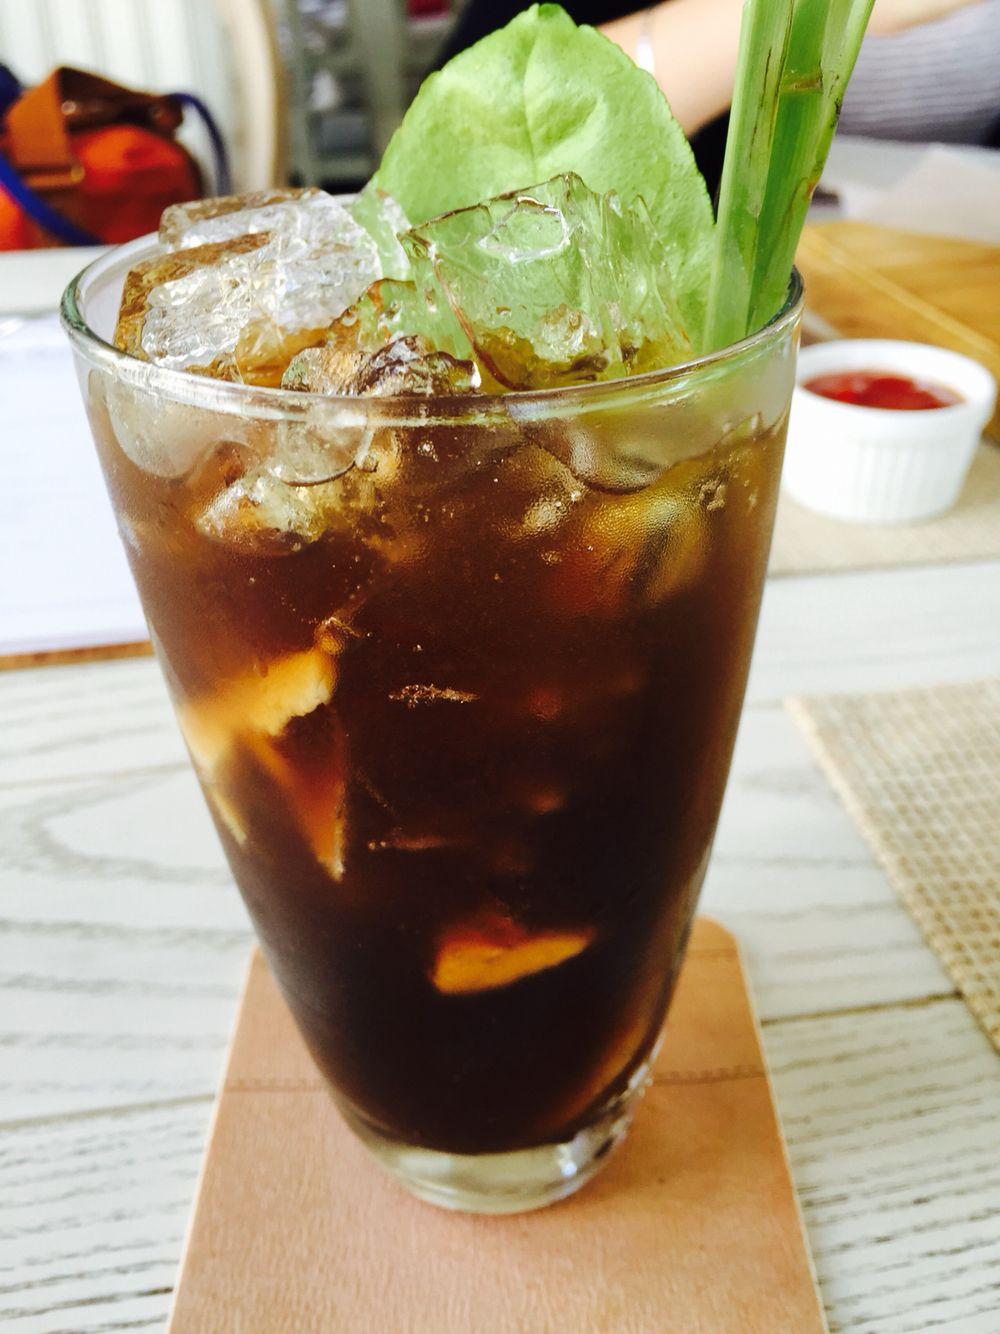 Gewaltig Zutaten Cuba Libre Ideen Von Tom Yam Coke Lemon Grass,lemon Juice, Kafir